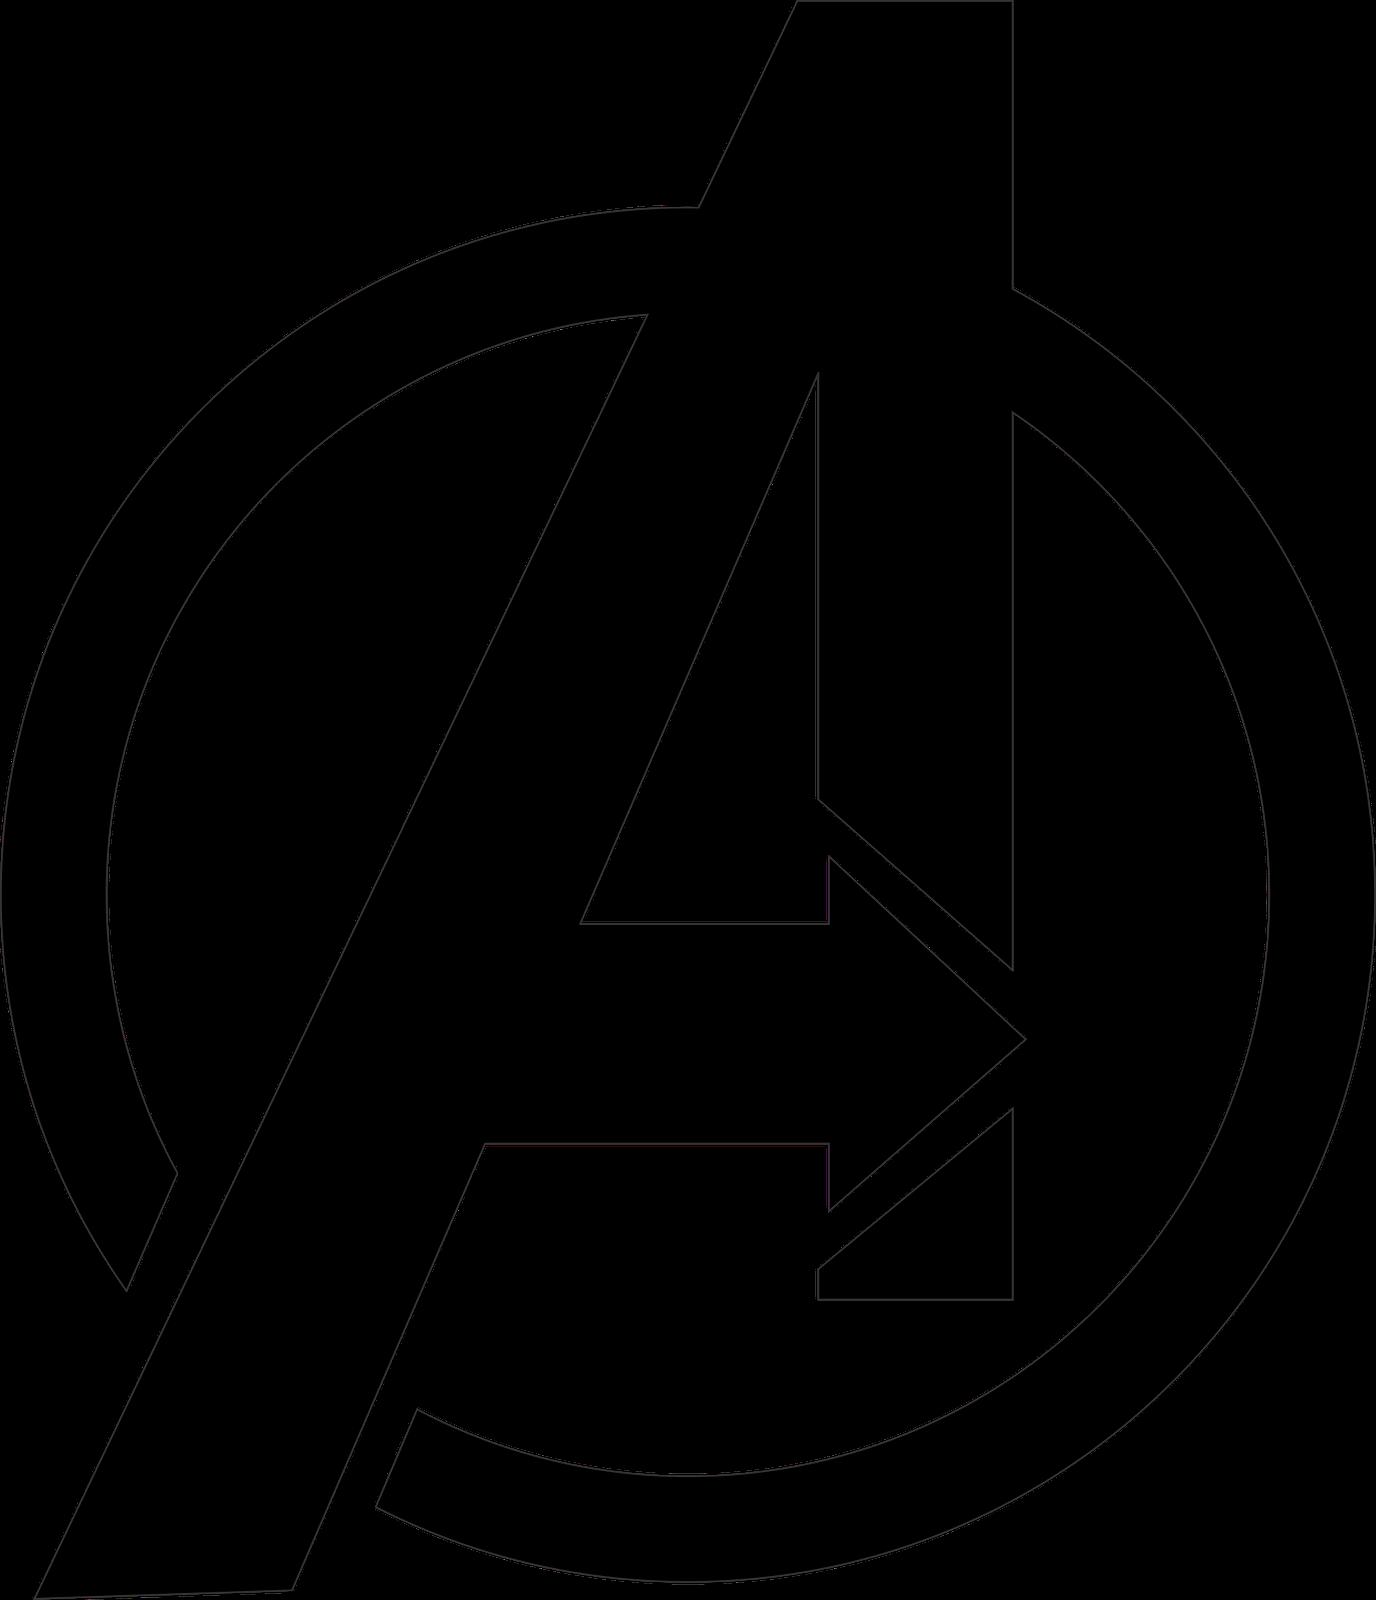 Denizignkos Freebies The Avengers Logo Vector Free